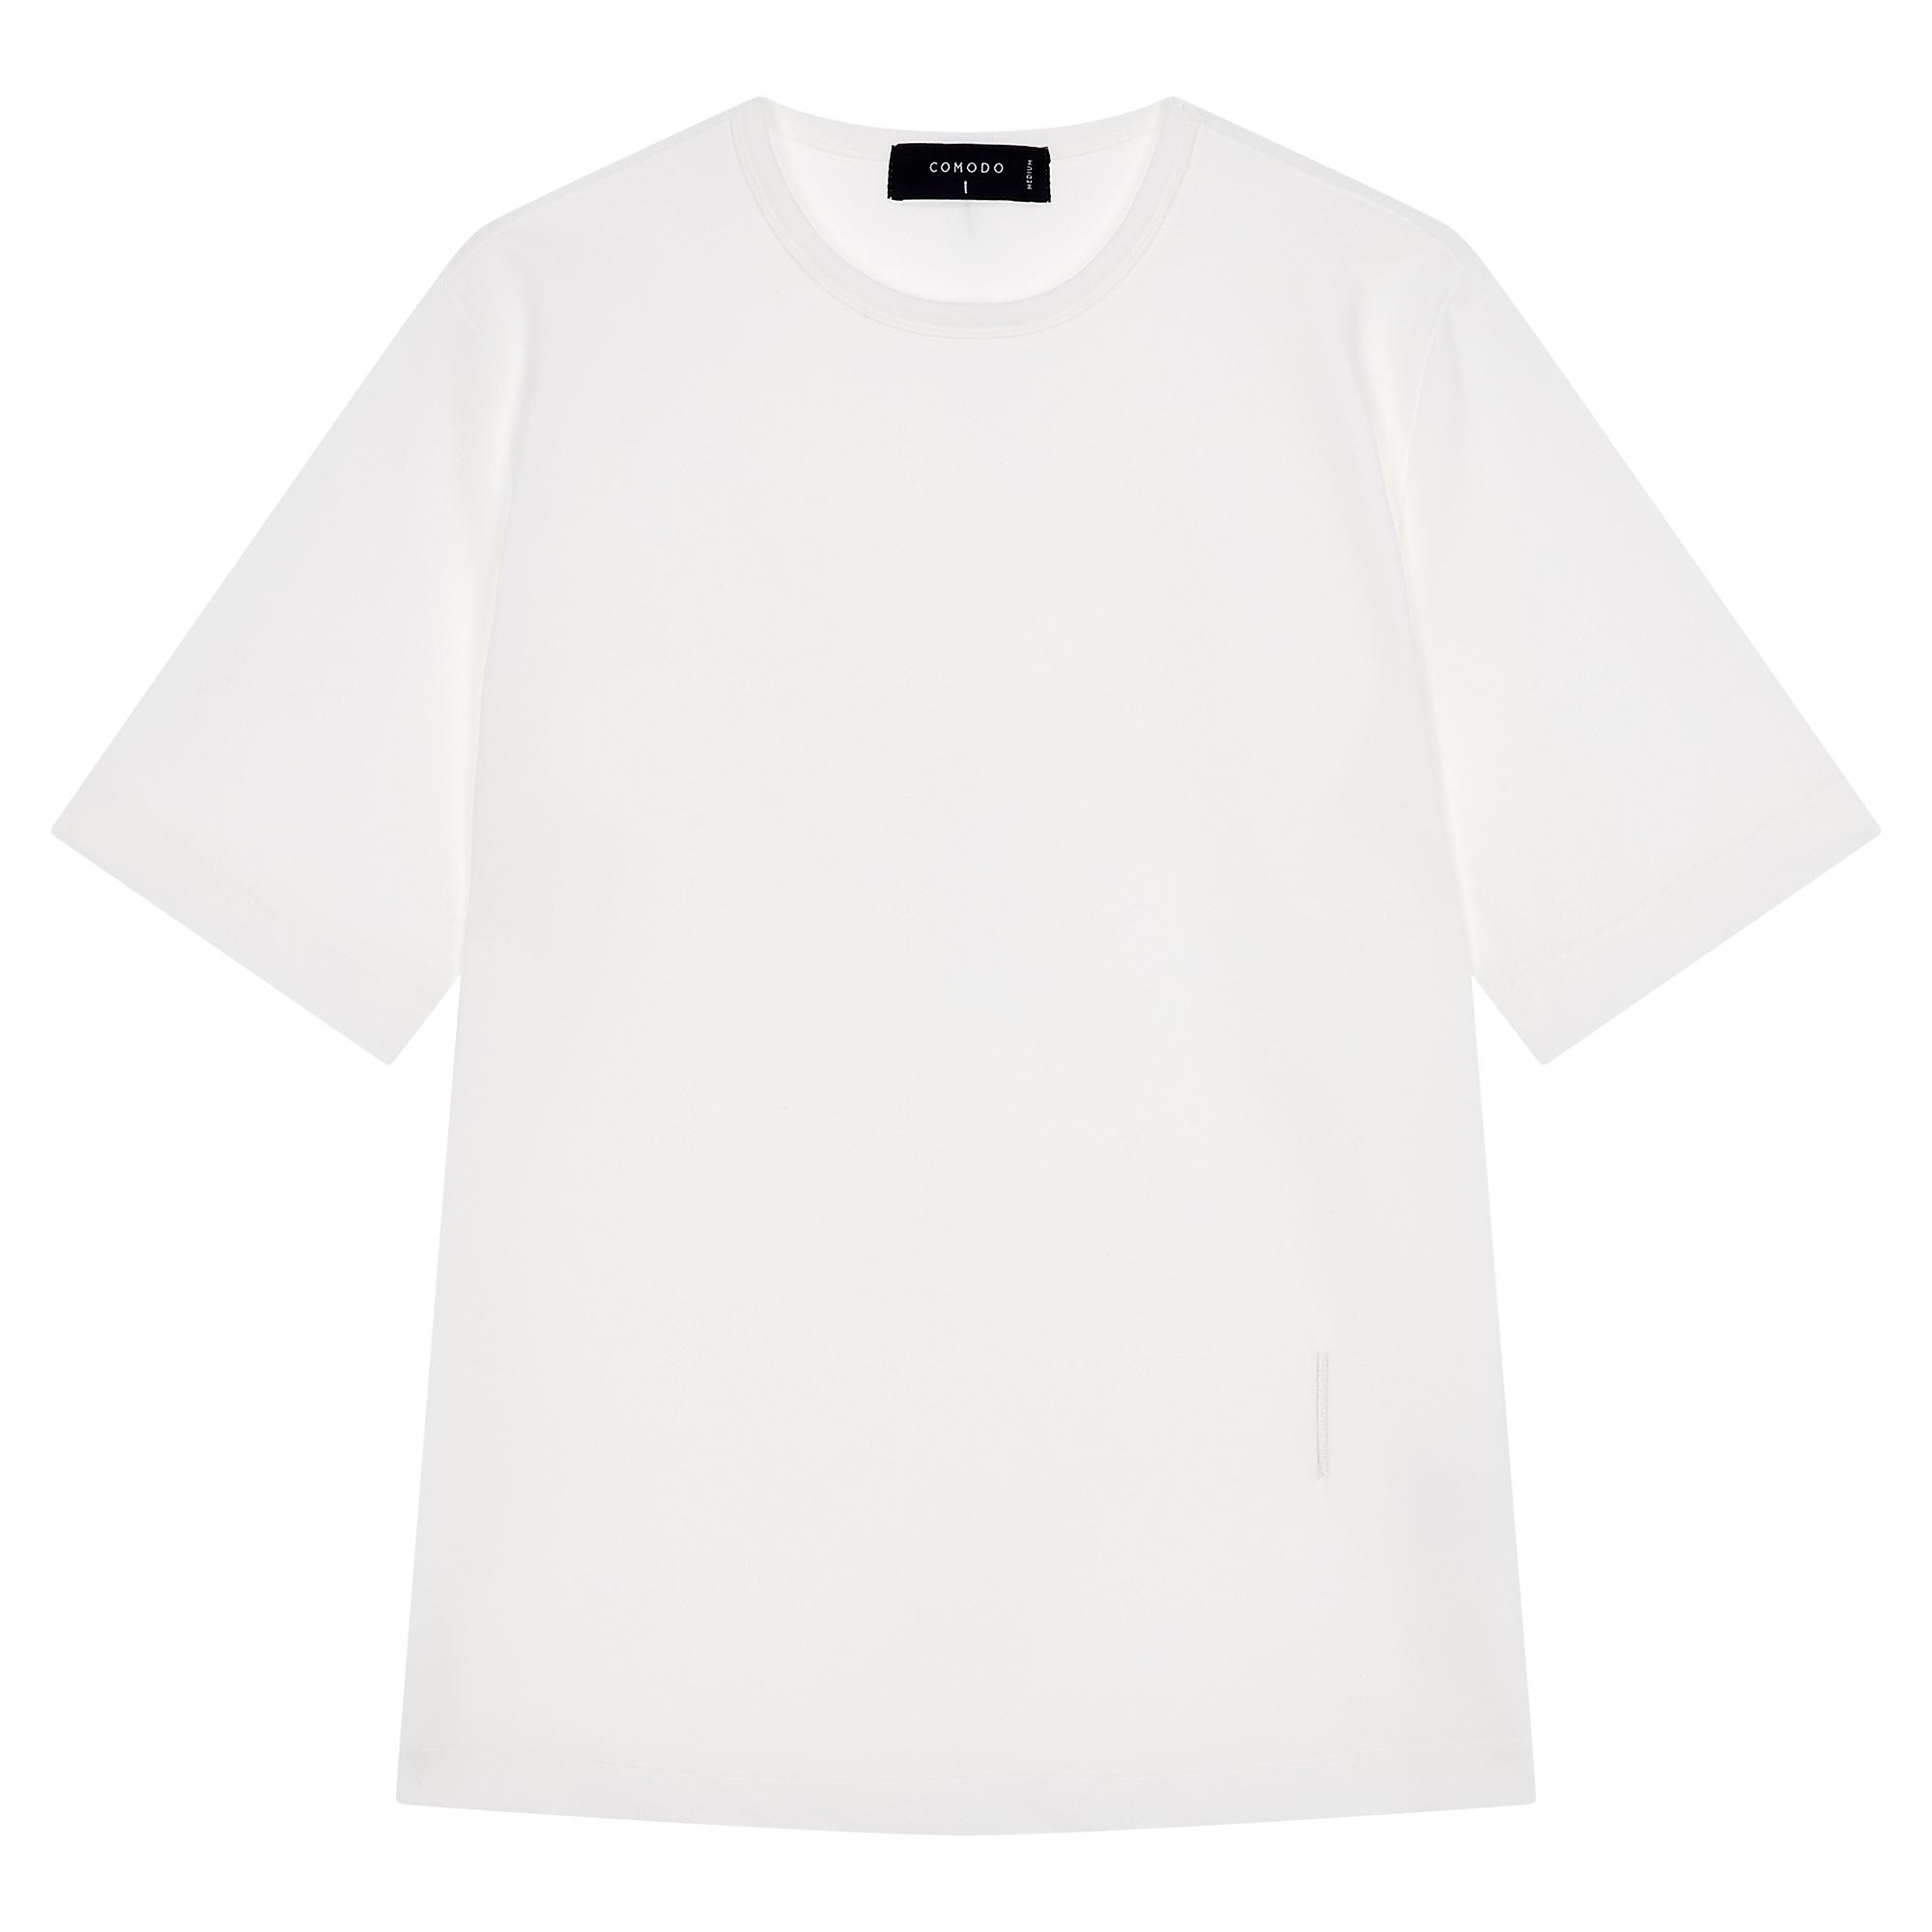 [ESSENTIAL] 베이직 라운드 반팔 티셔츠